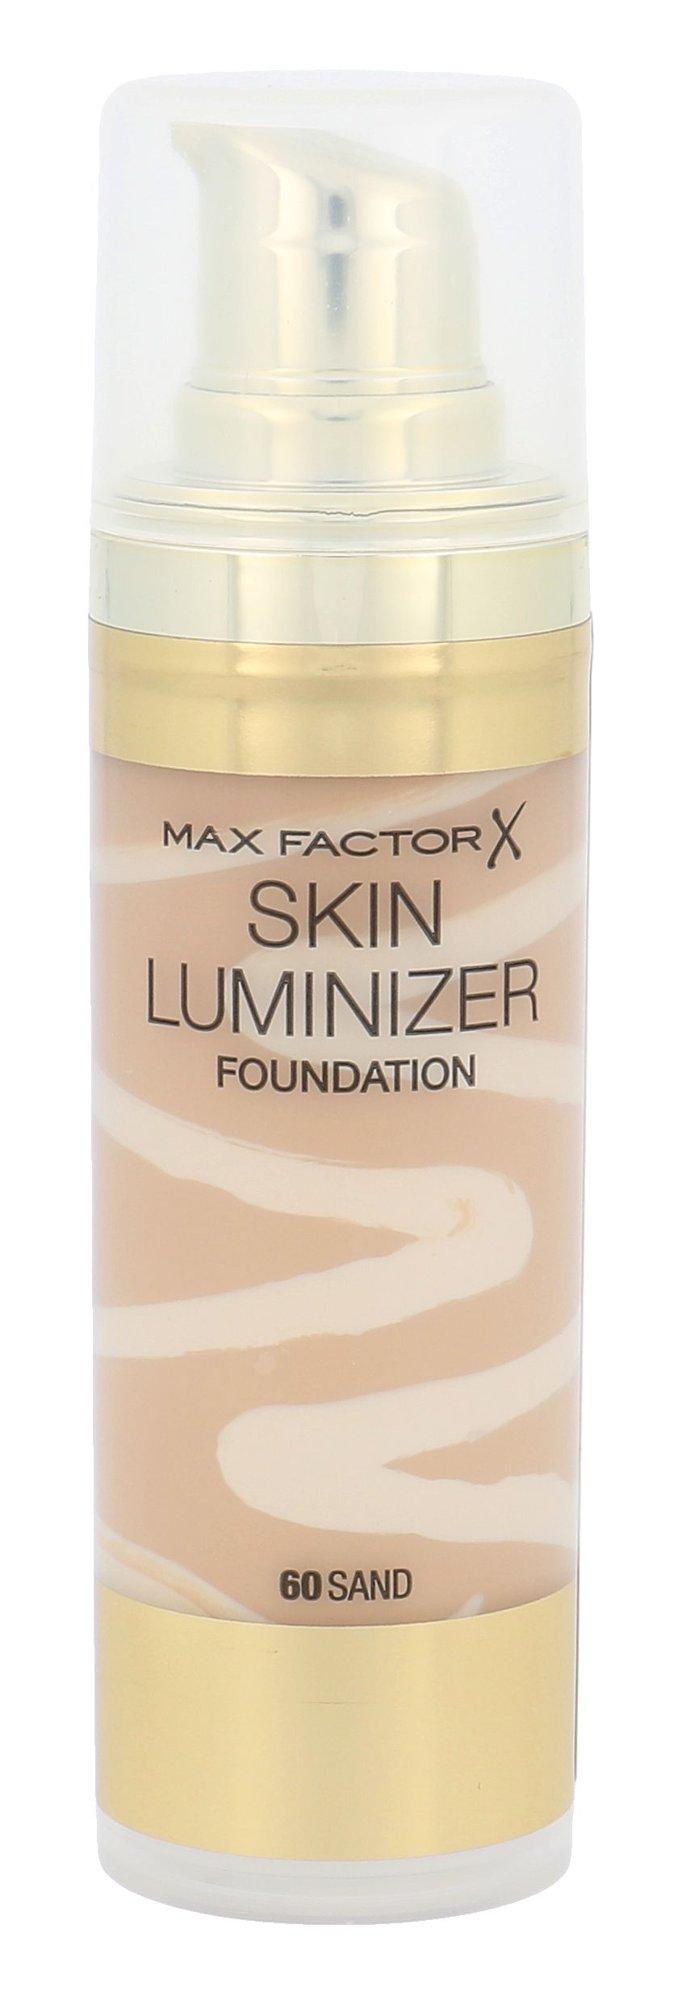 Max Factor Skin Luminizer Cosmetic 30ml 60 Sand